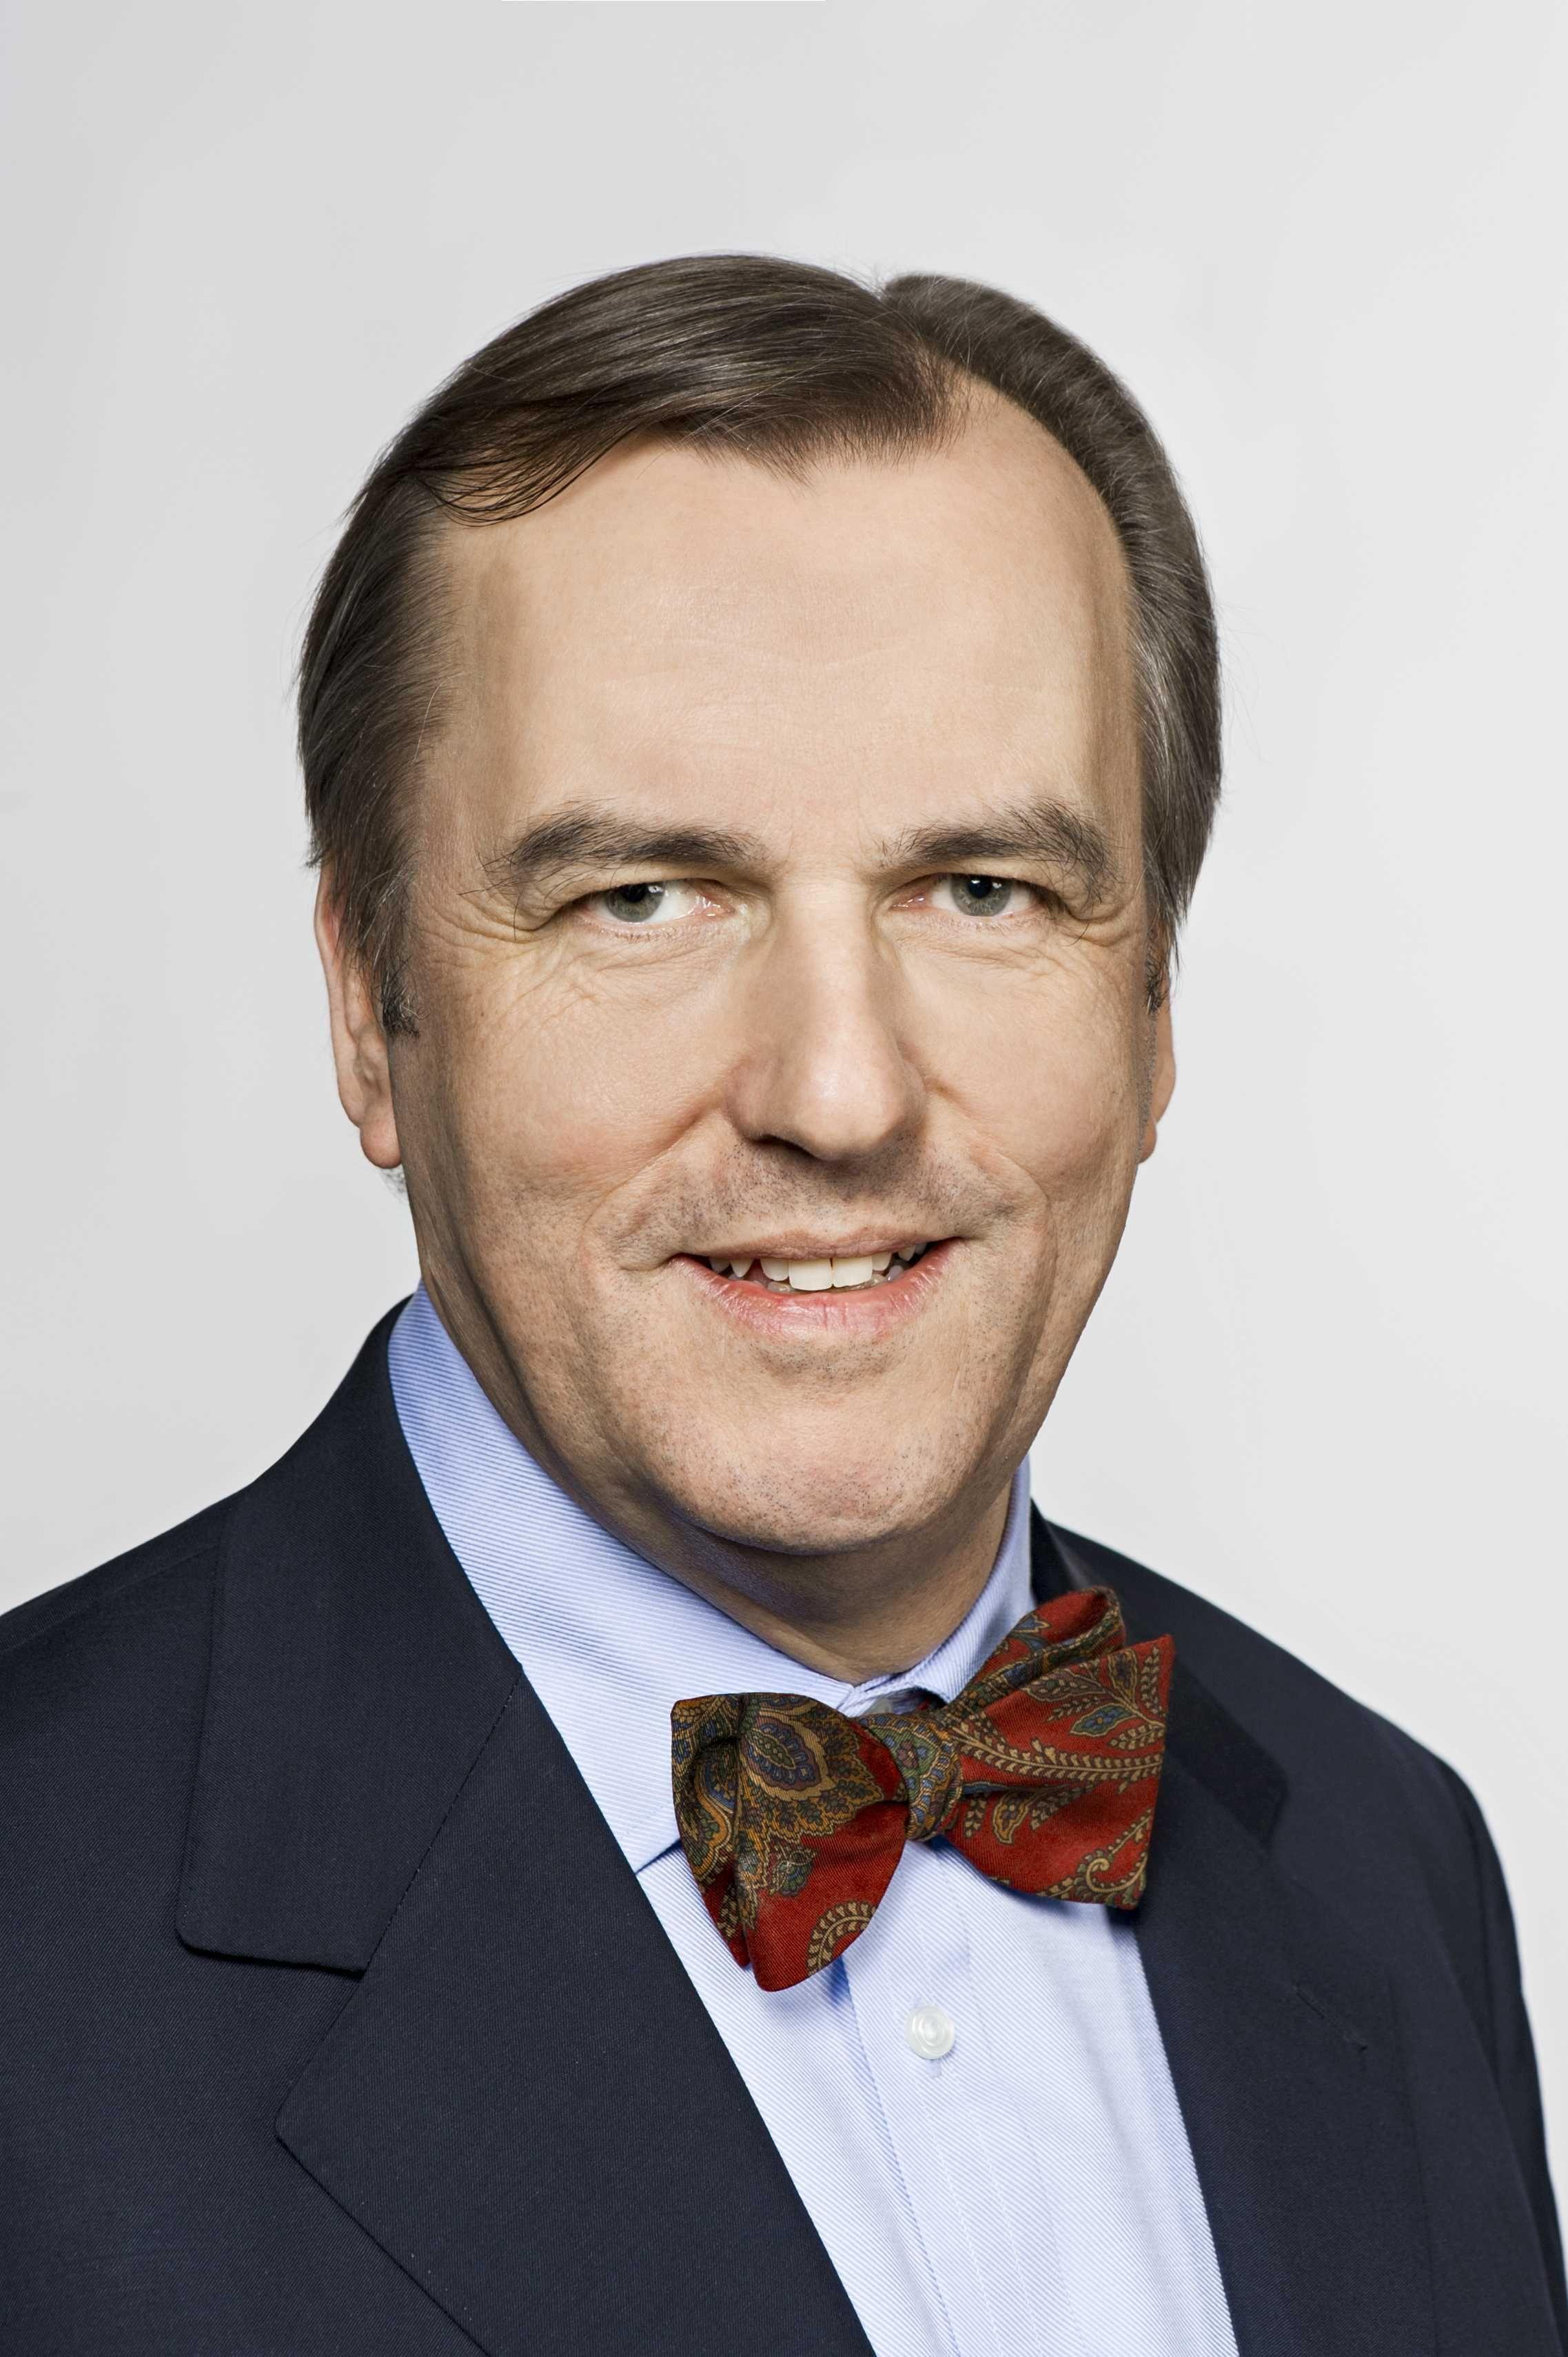 Prof. Dr.-Ing. Robert Hertle, founder of Hertle Ingenieure